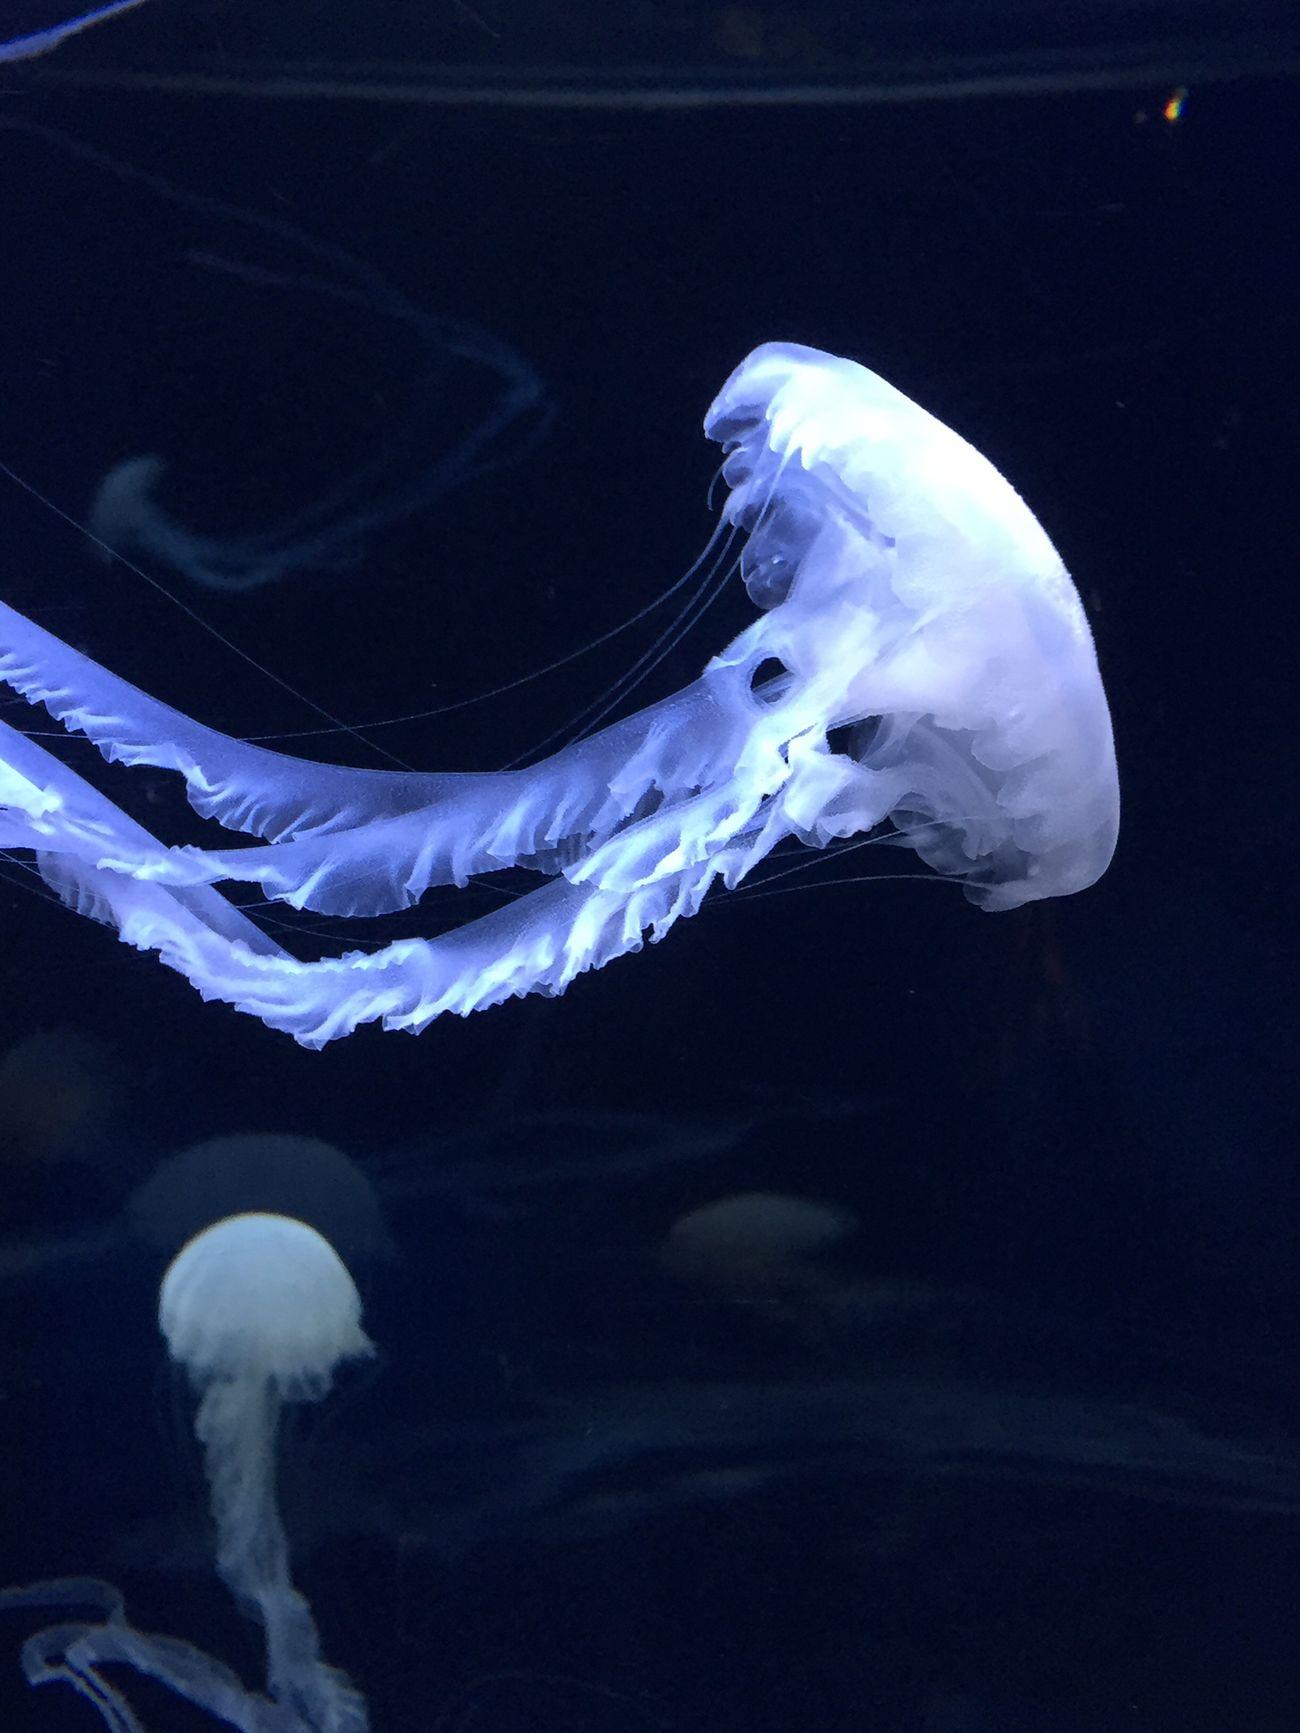 Aquarium クラゲ Water_collection Jellyfish Landscape_Collection Taking Photos Microcosm Relaxing Aquarium